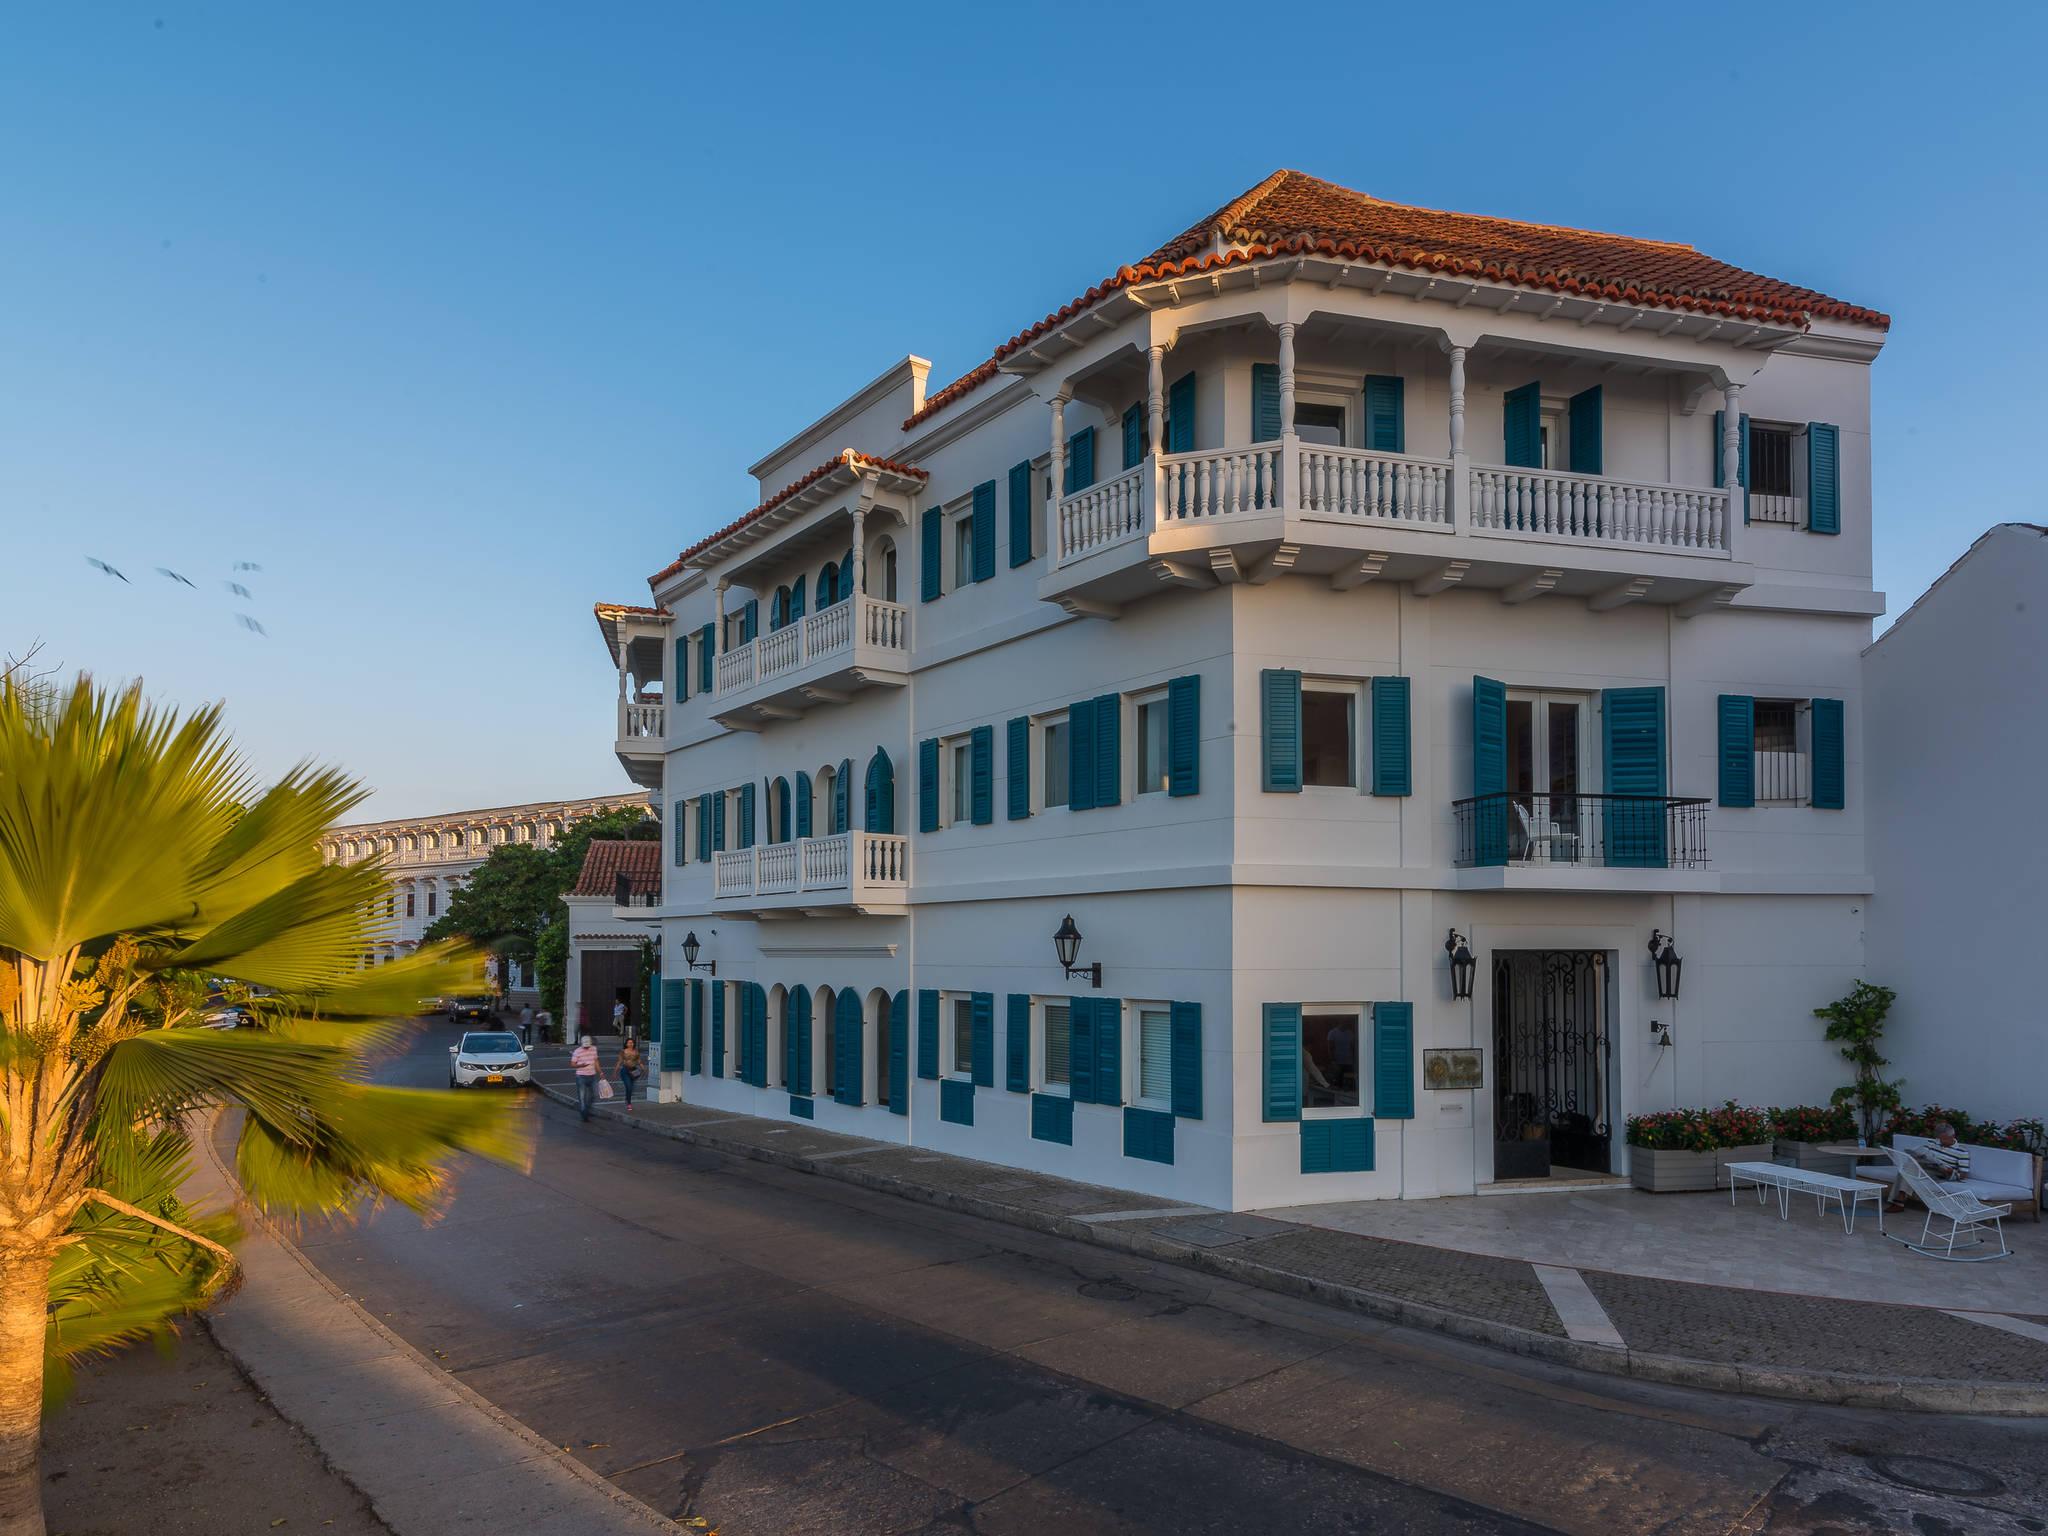 فندق - Hotel Boutique Bovedas de Santa Clara